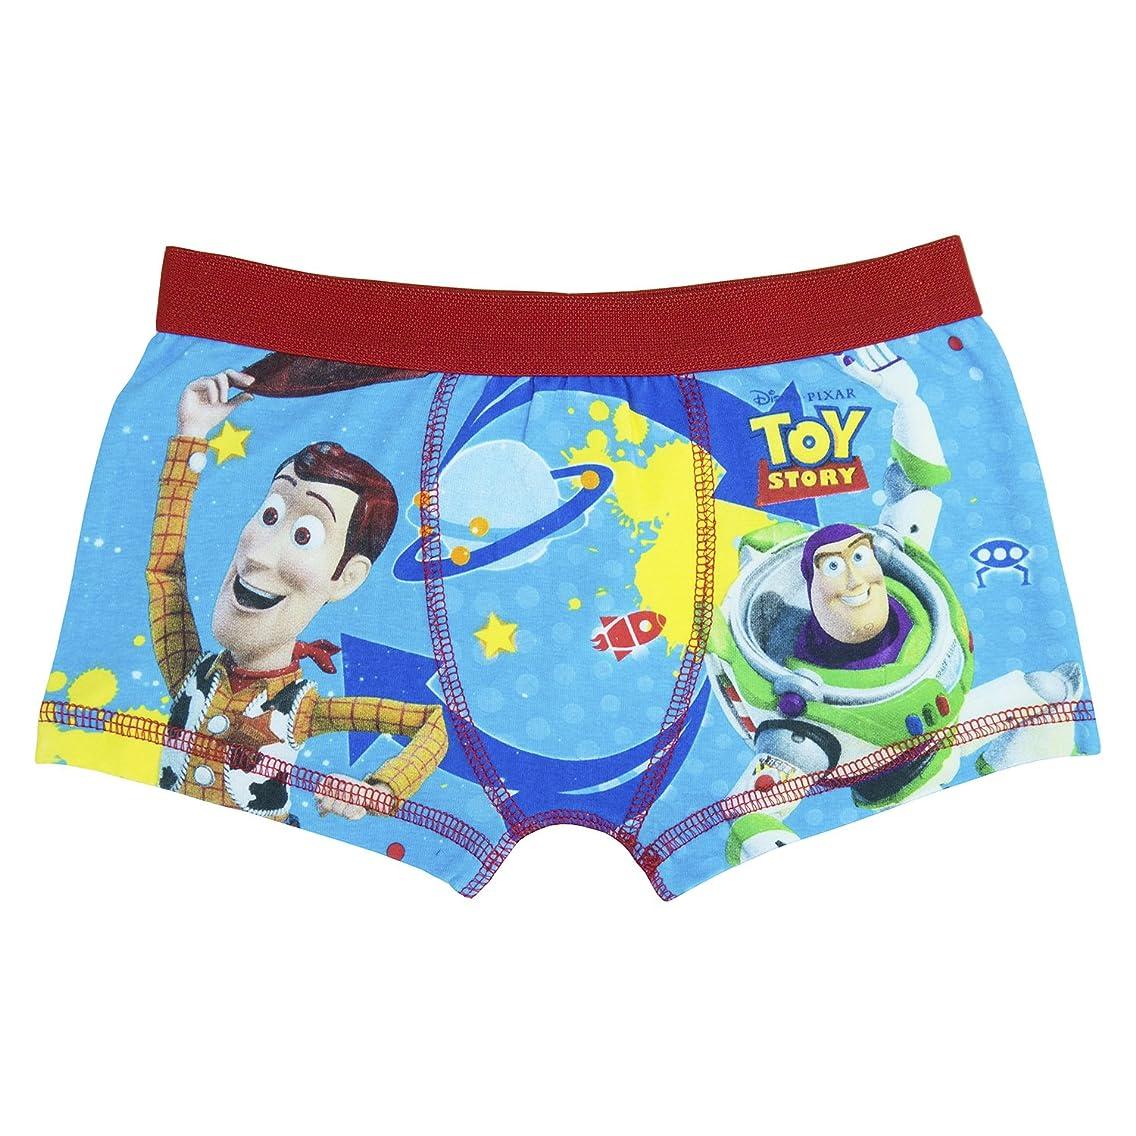 Toy Story Boys Boxer Shorts Boys Boxer Shorts - Age 3-7 Years